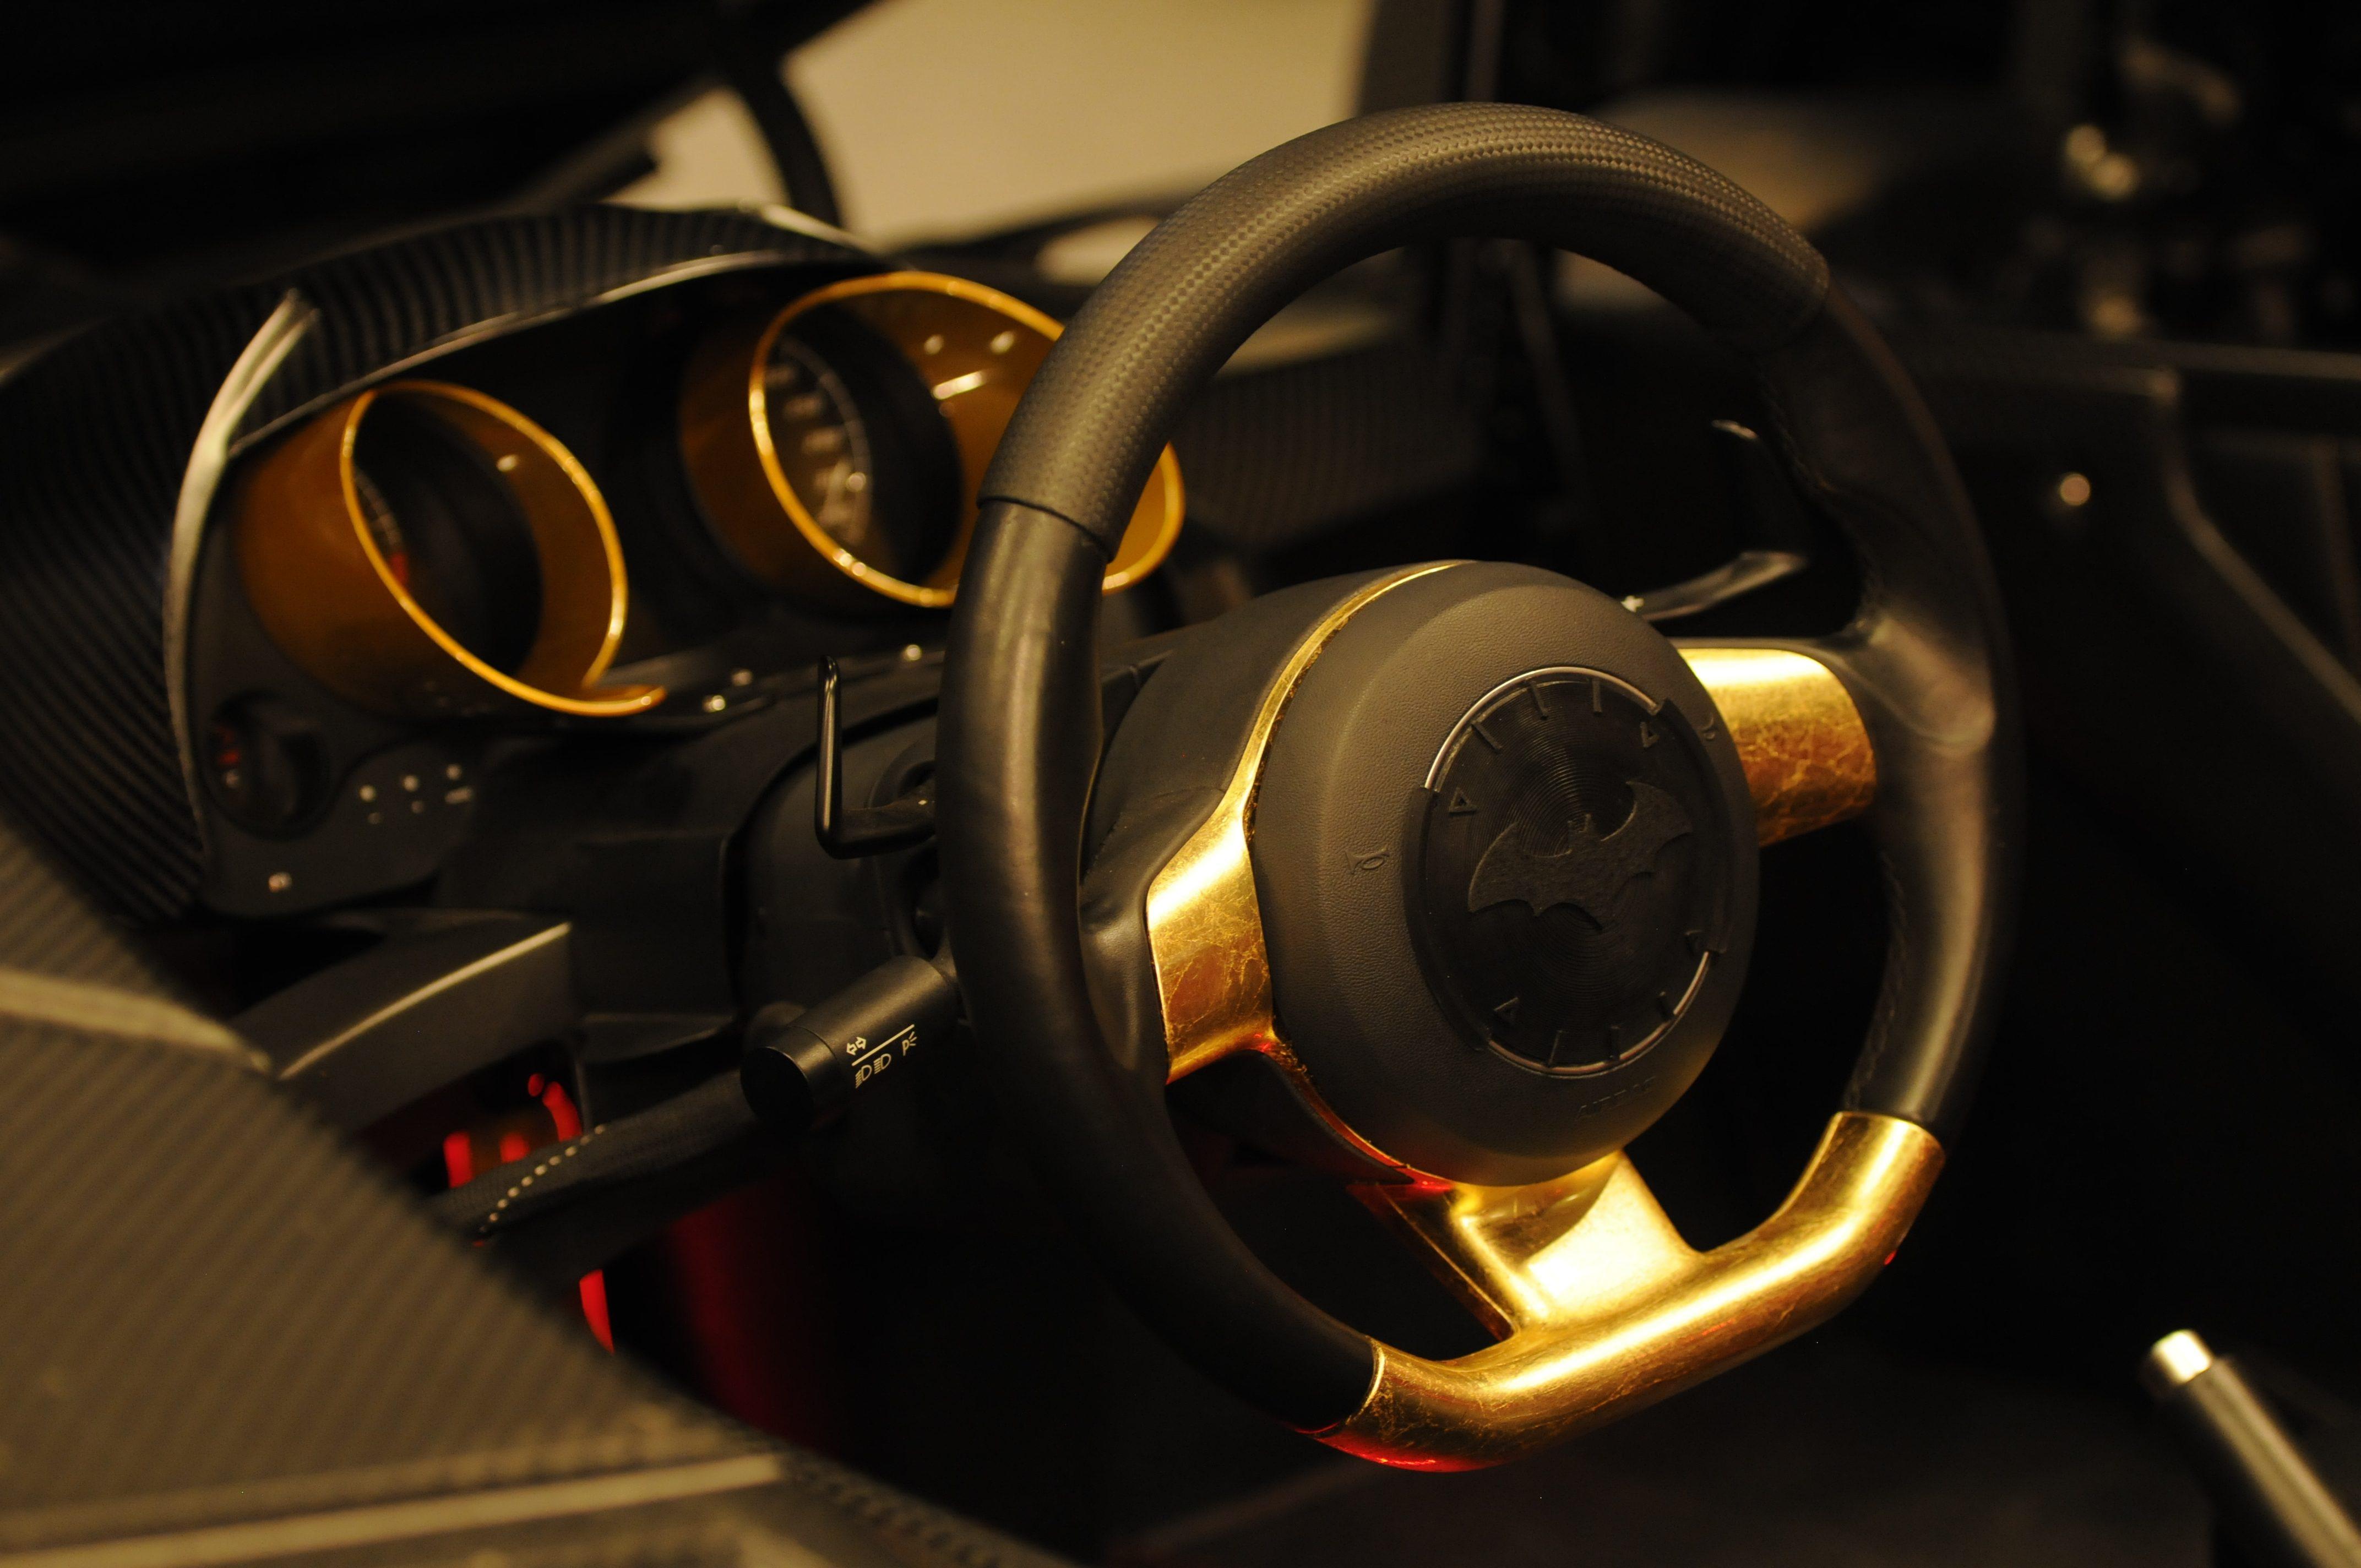 Caresto Arkham Car – 3D printed parts by Thomas Palm - Palmiga Innovation / Rubber3Dprinting.com – New Movie